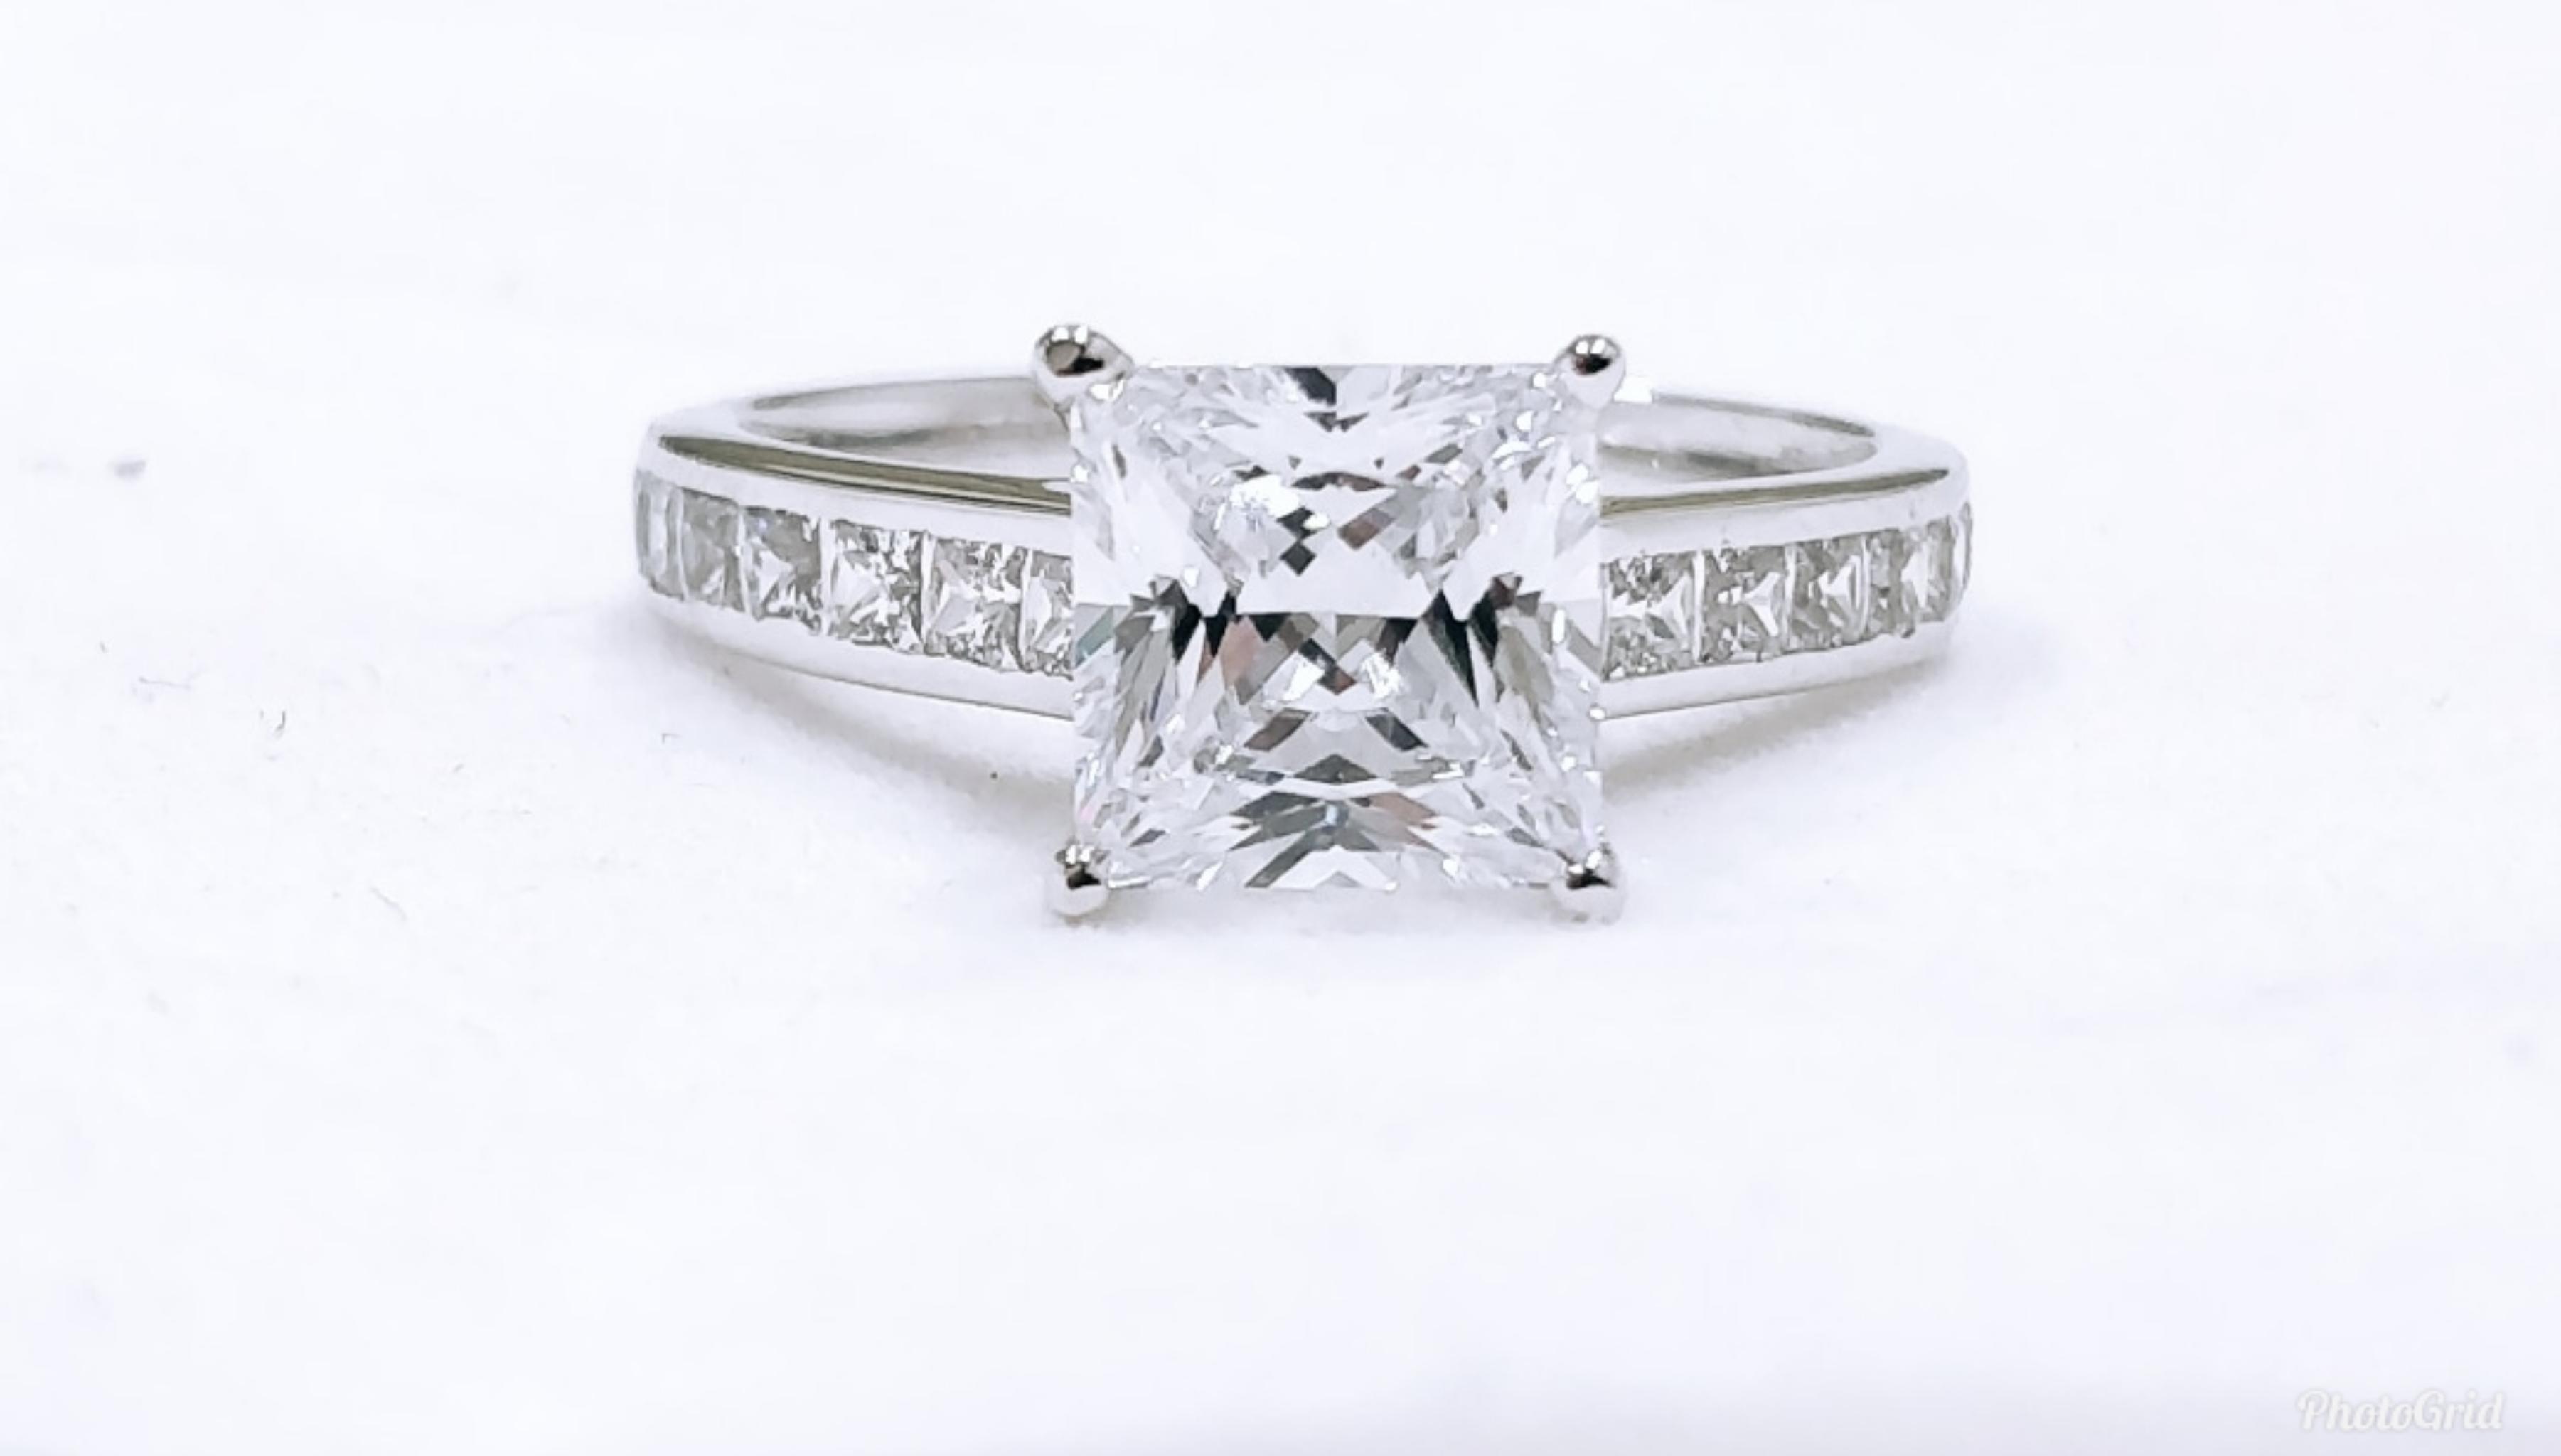 Brilliant Princess Cut Diamond 2 5ct Solitaire Ring Real